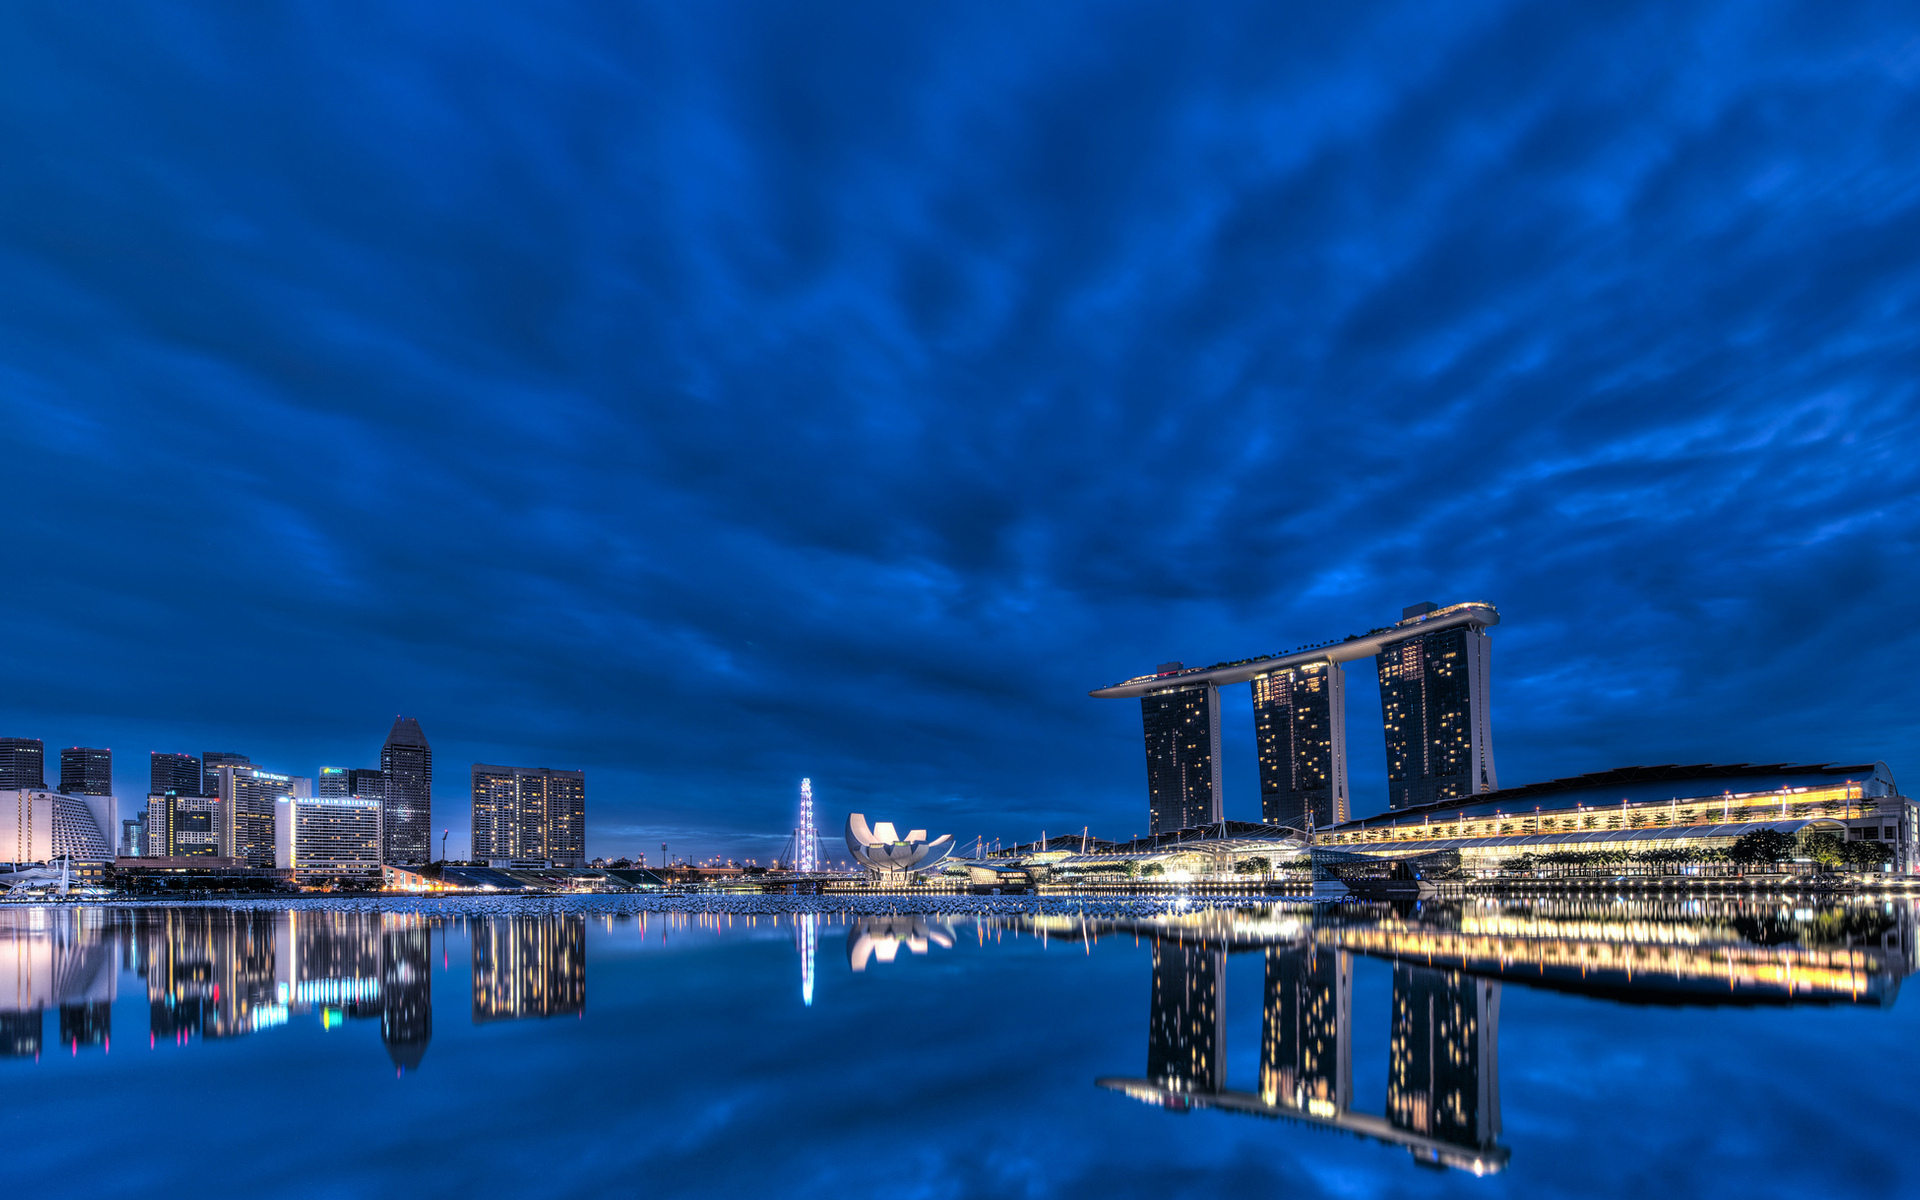 страны архитектура Сингапур ночь  № 1476078 бесплатно